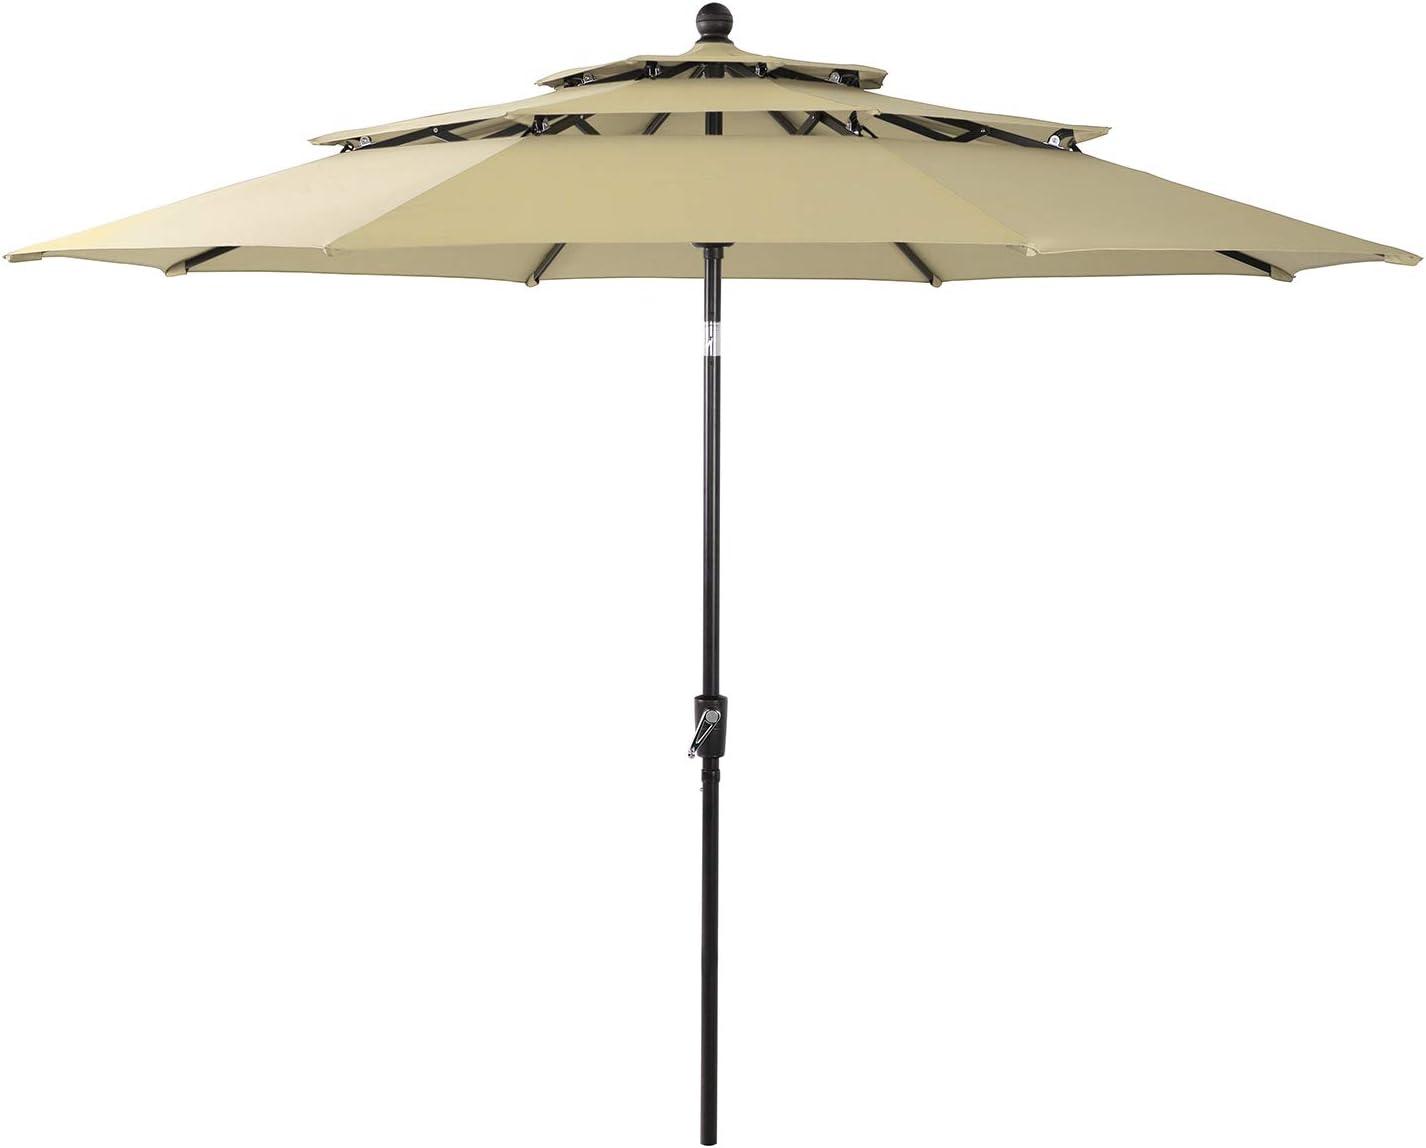 Sophia & William 10ft 3 Tier Auto-tilt Patio Umbrella Outdoor Double Vented Umbrella with Crank,Beige